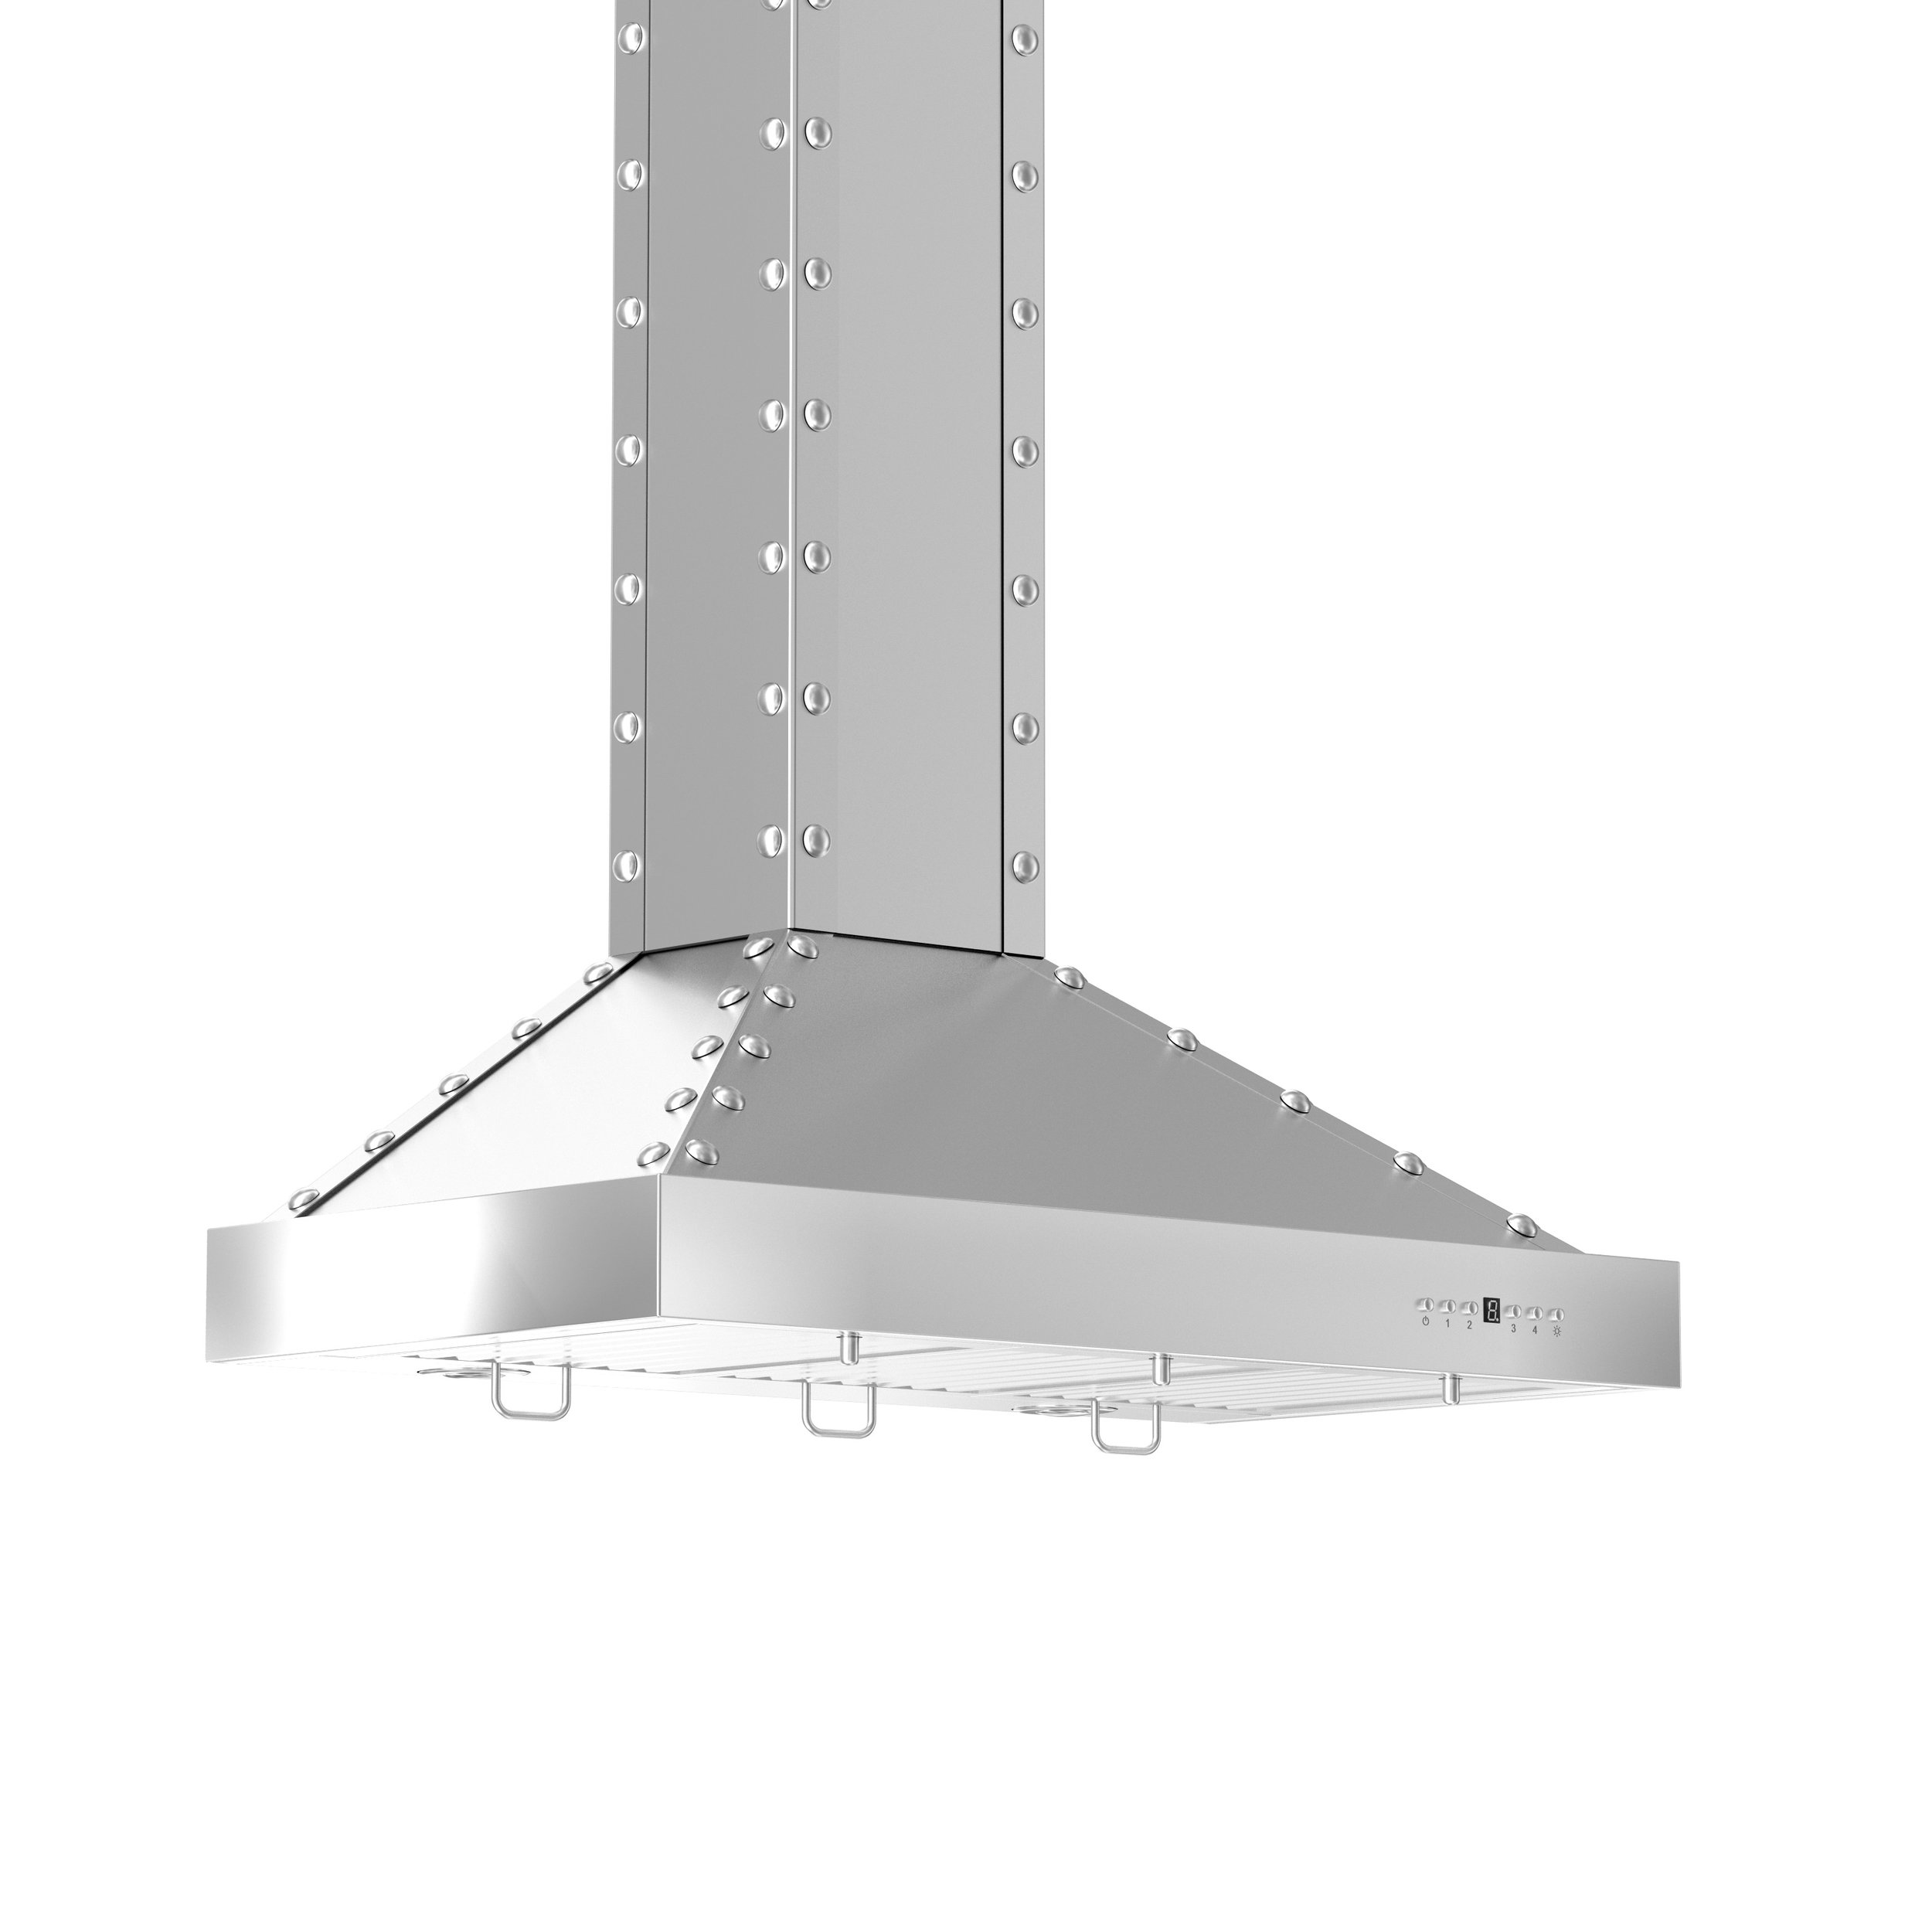 zline-stainless-steel-wall-mounted-range-hood-KB2-4SSXS-main.jpeg